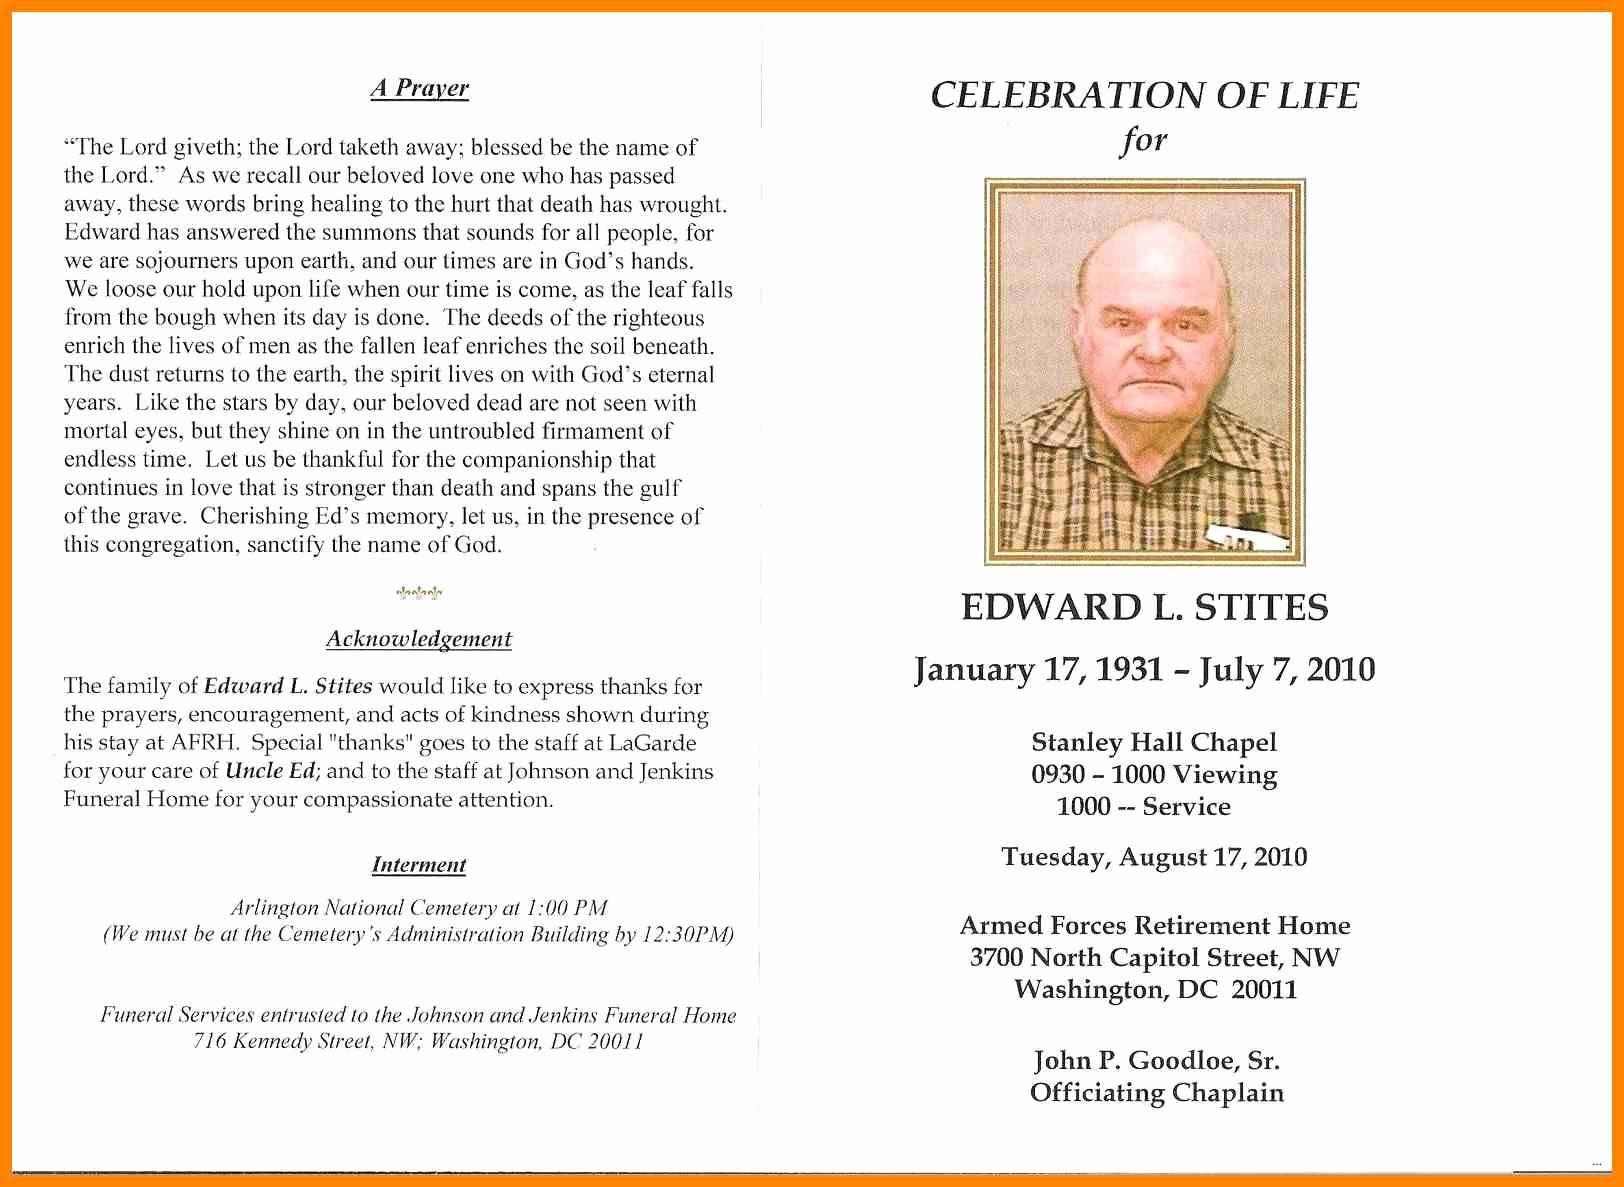 002 Celebration Of Life Program Template Free Printable Memorial - Free Printable Memorial Card Template